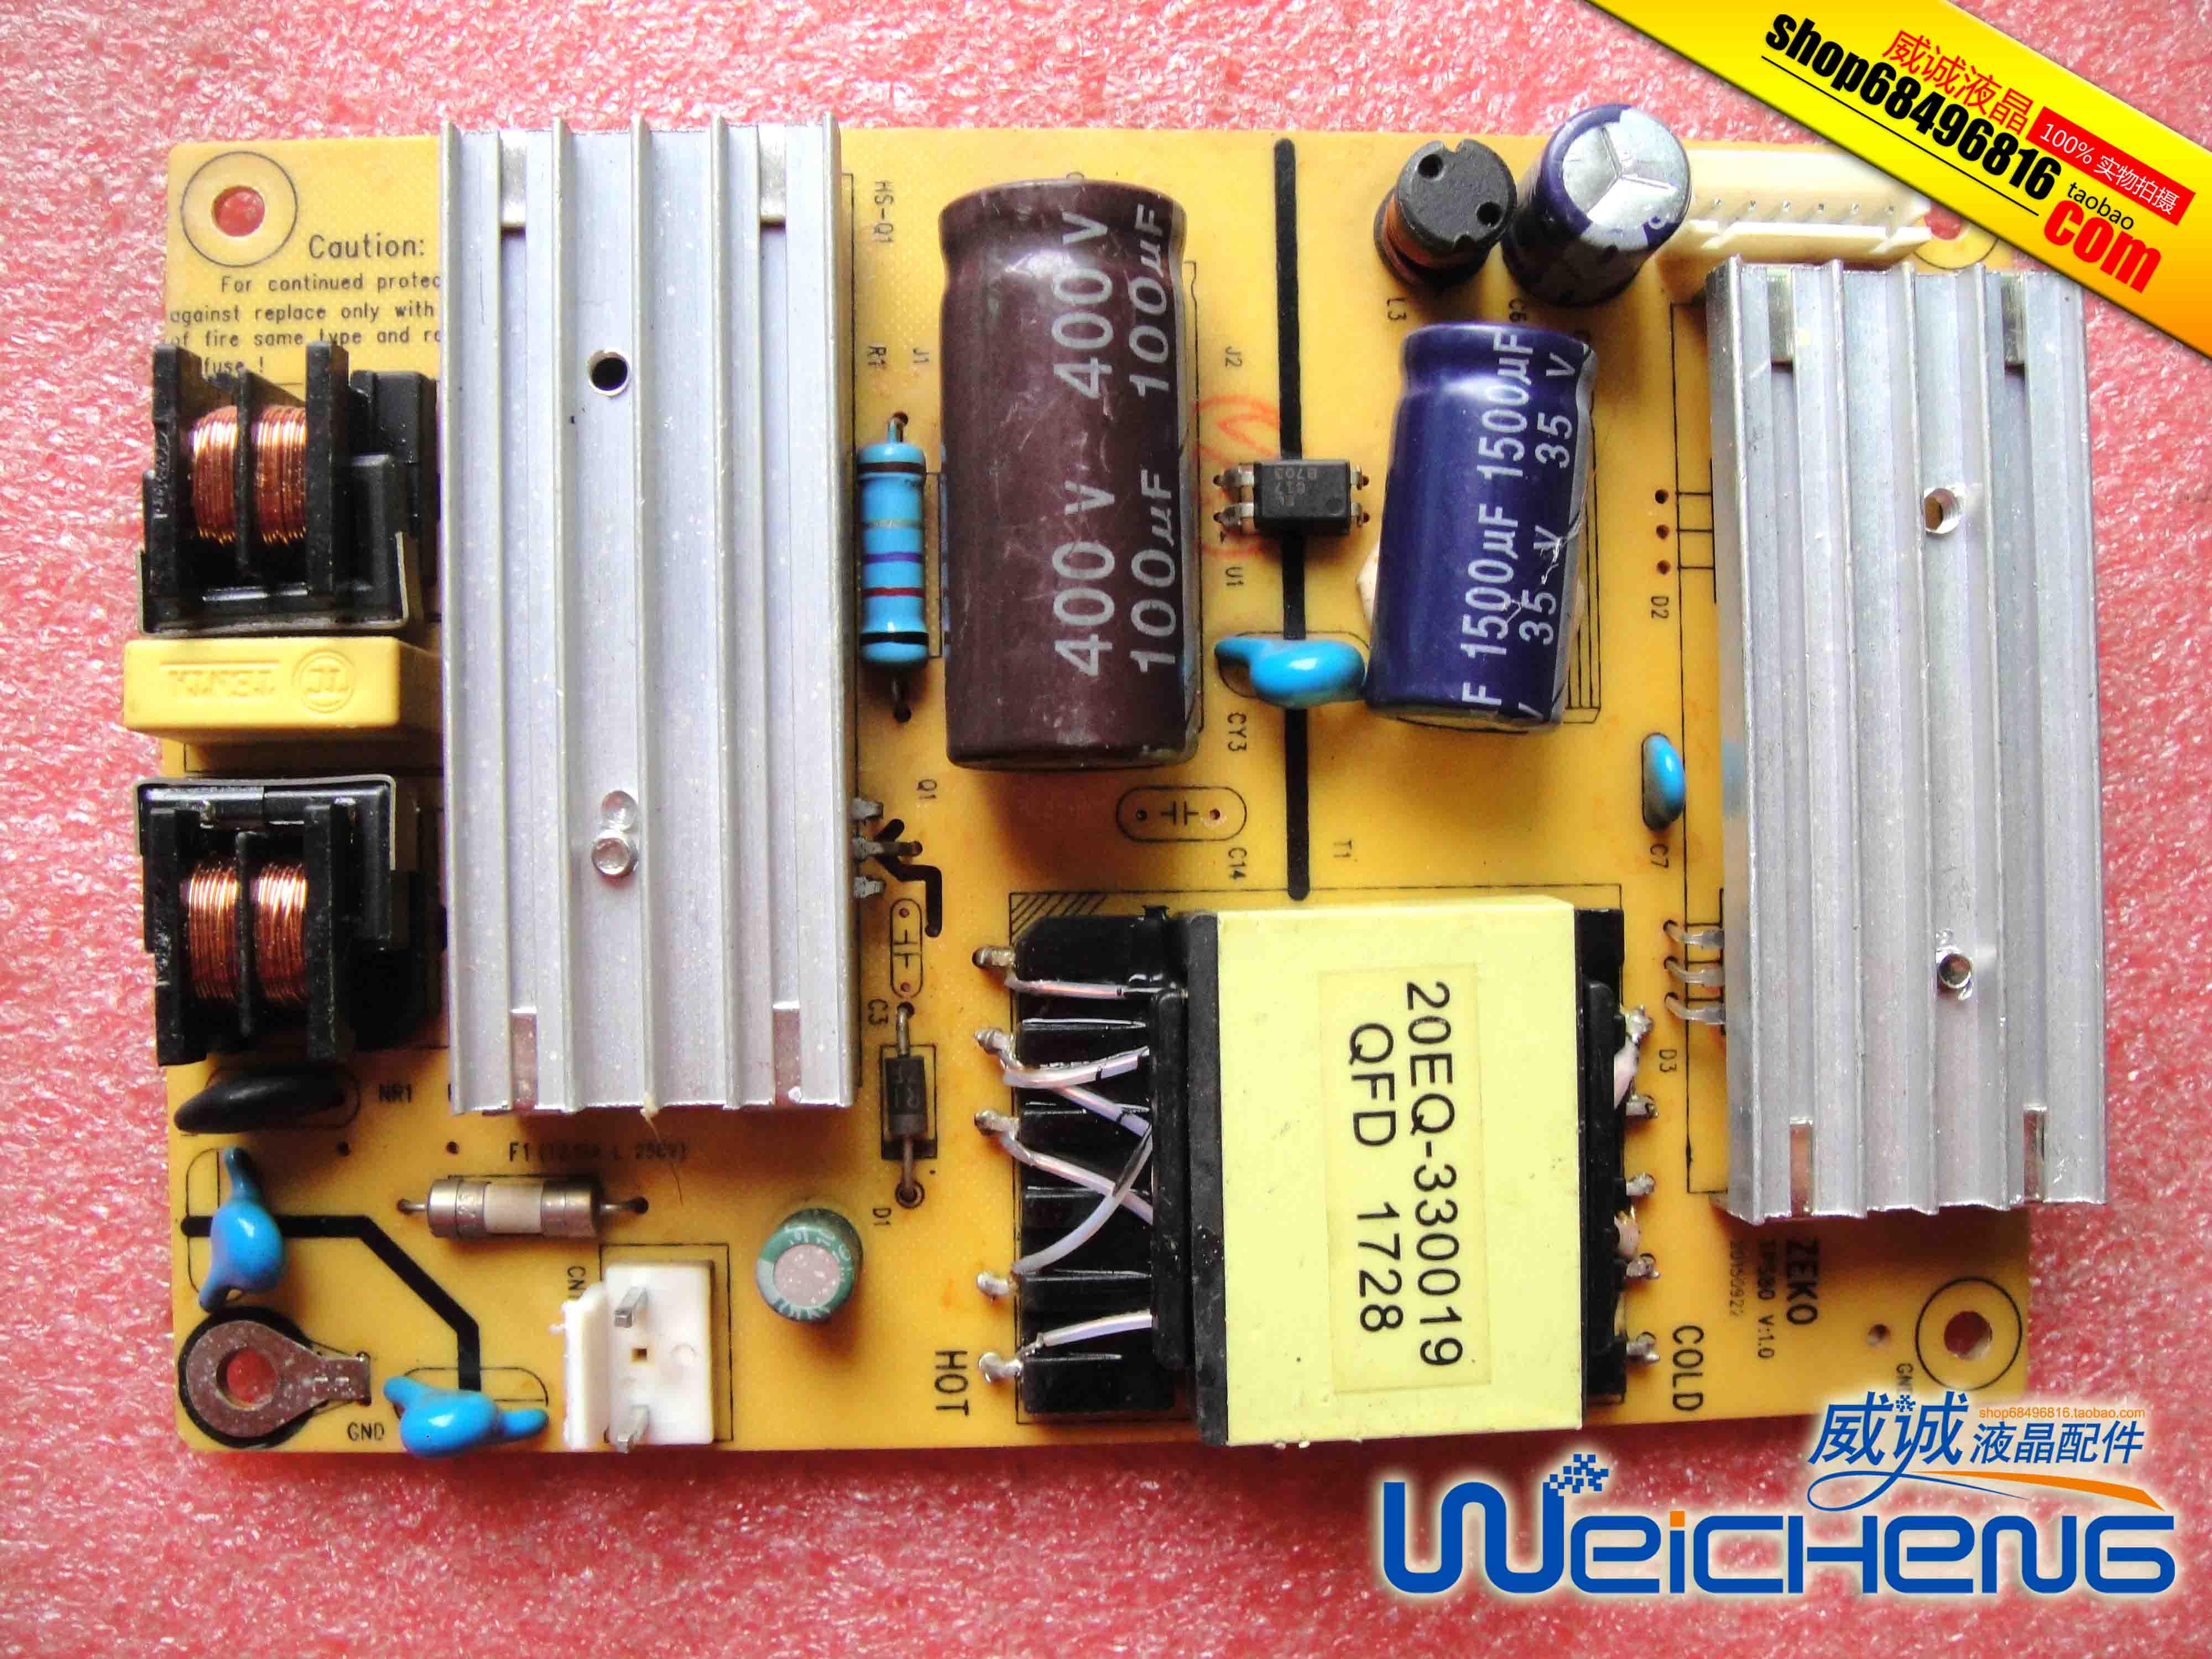 DF401 MC40F E3219G power supply board DB-01-2400-DF40000 TPS80-2425